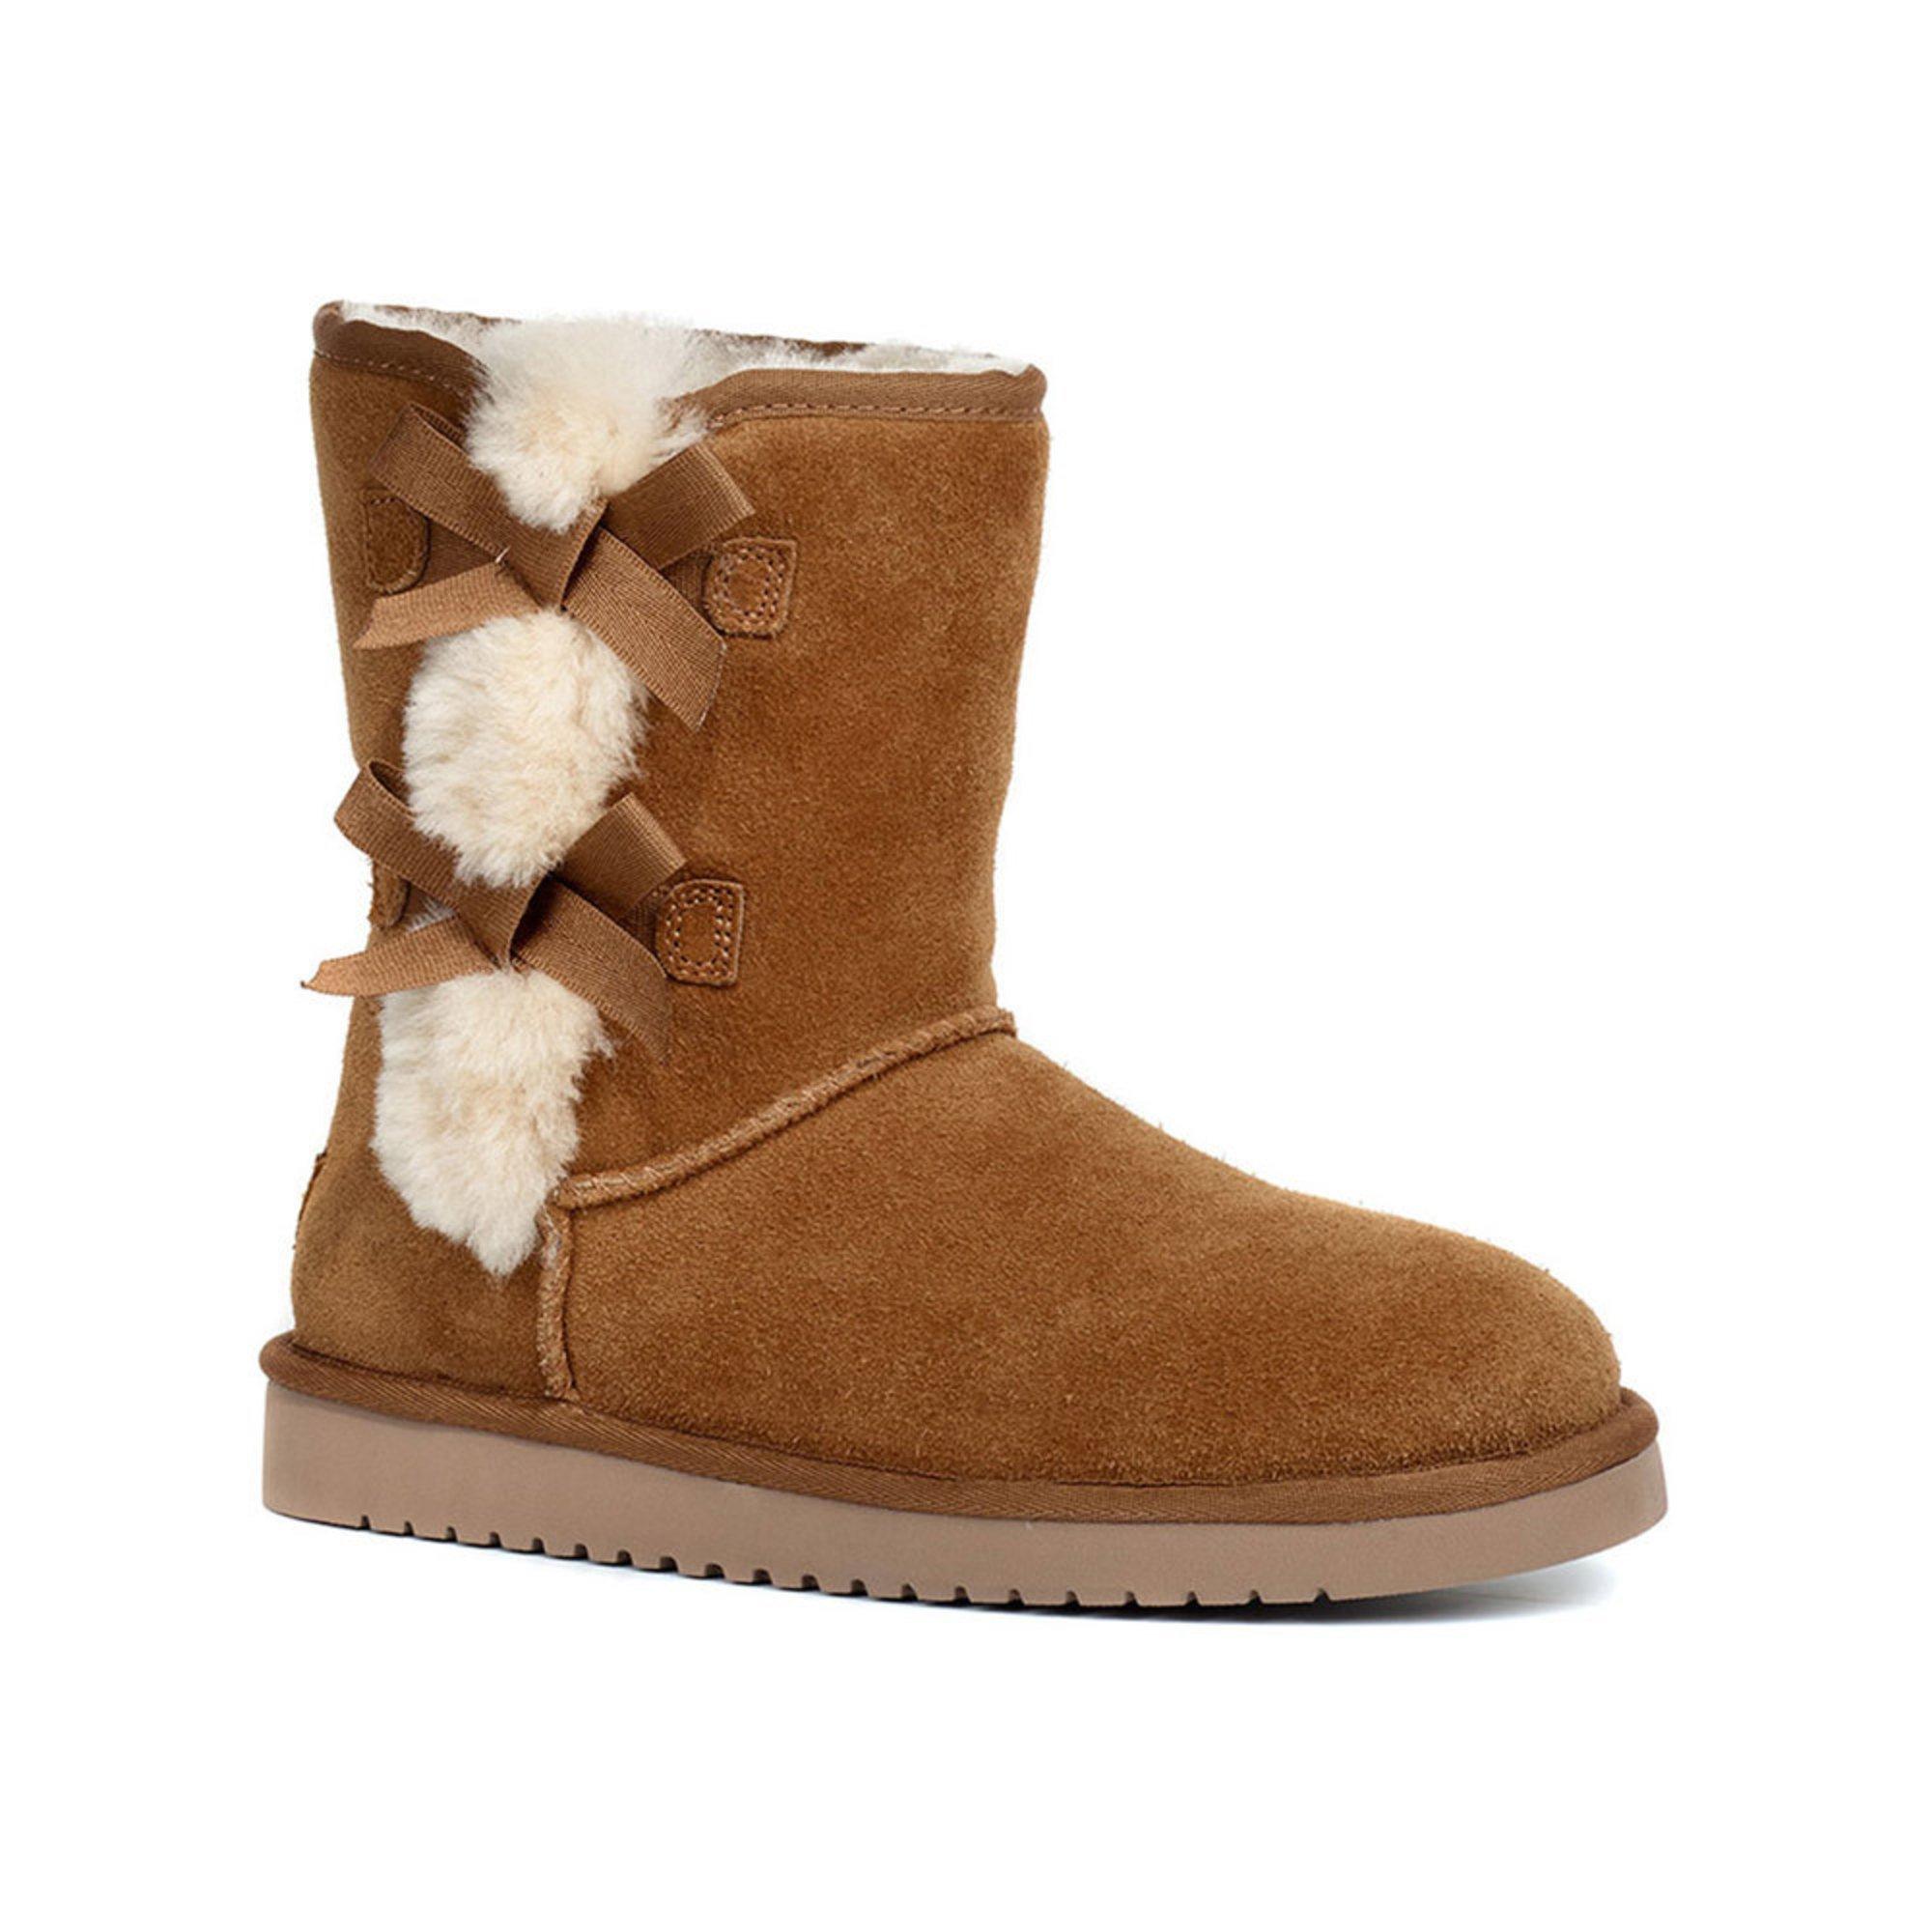 Koolaburra By Ugg Women's Victoria Short Side Trim Boot